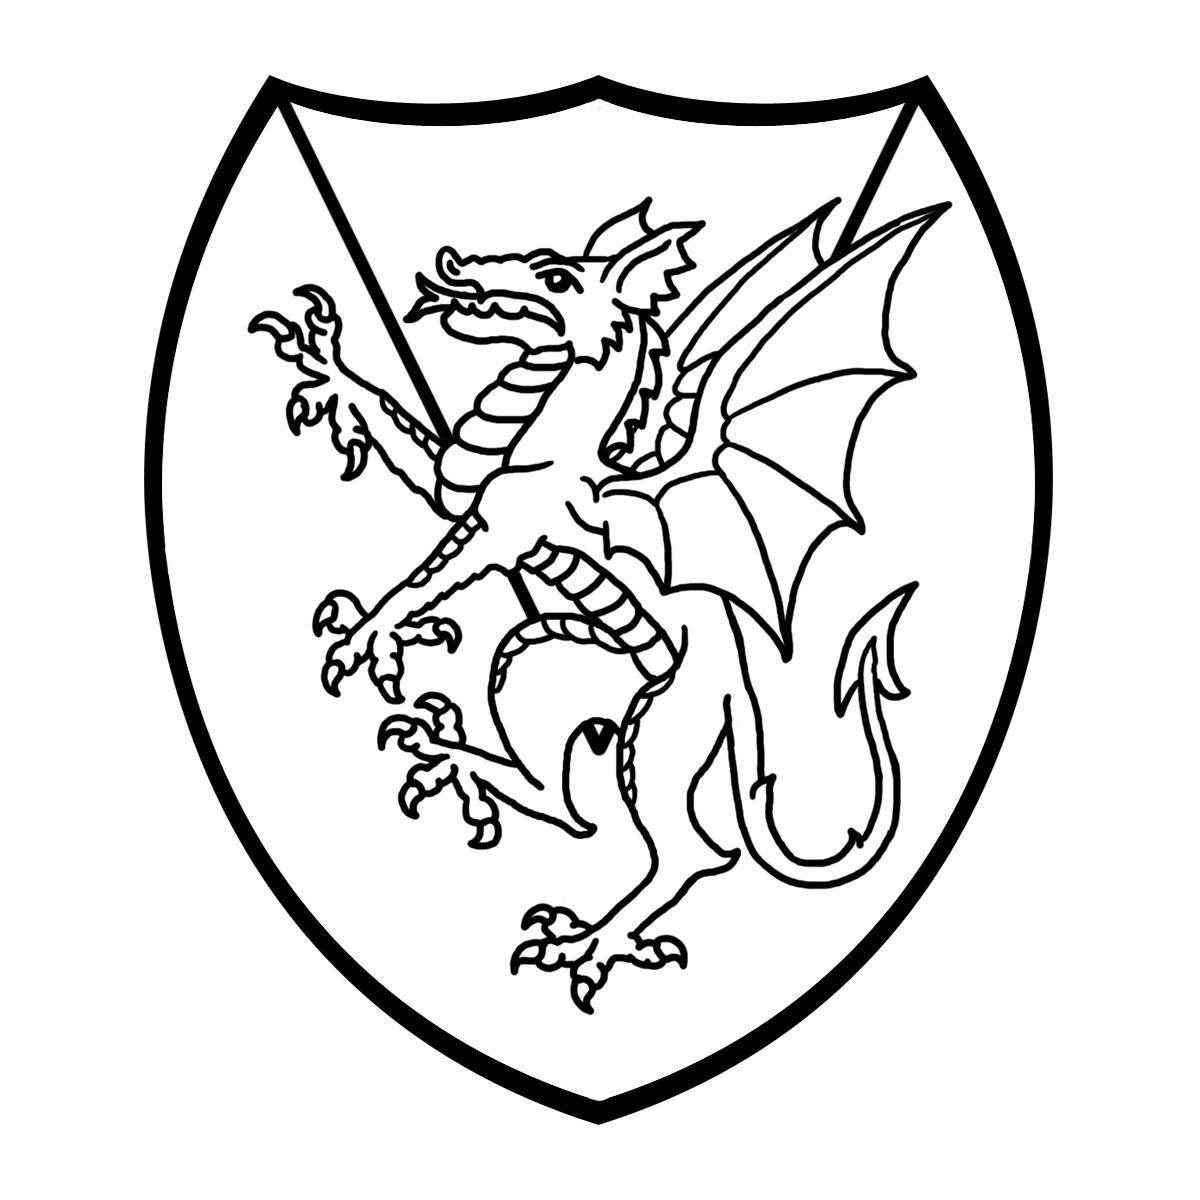 Clip Art: Heraldry: Dragon .-Clip Art: Heraldry: Dragon .-4